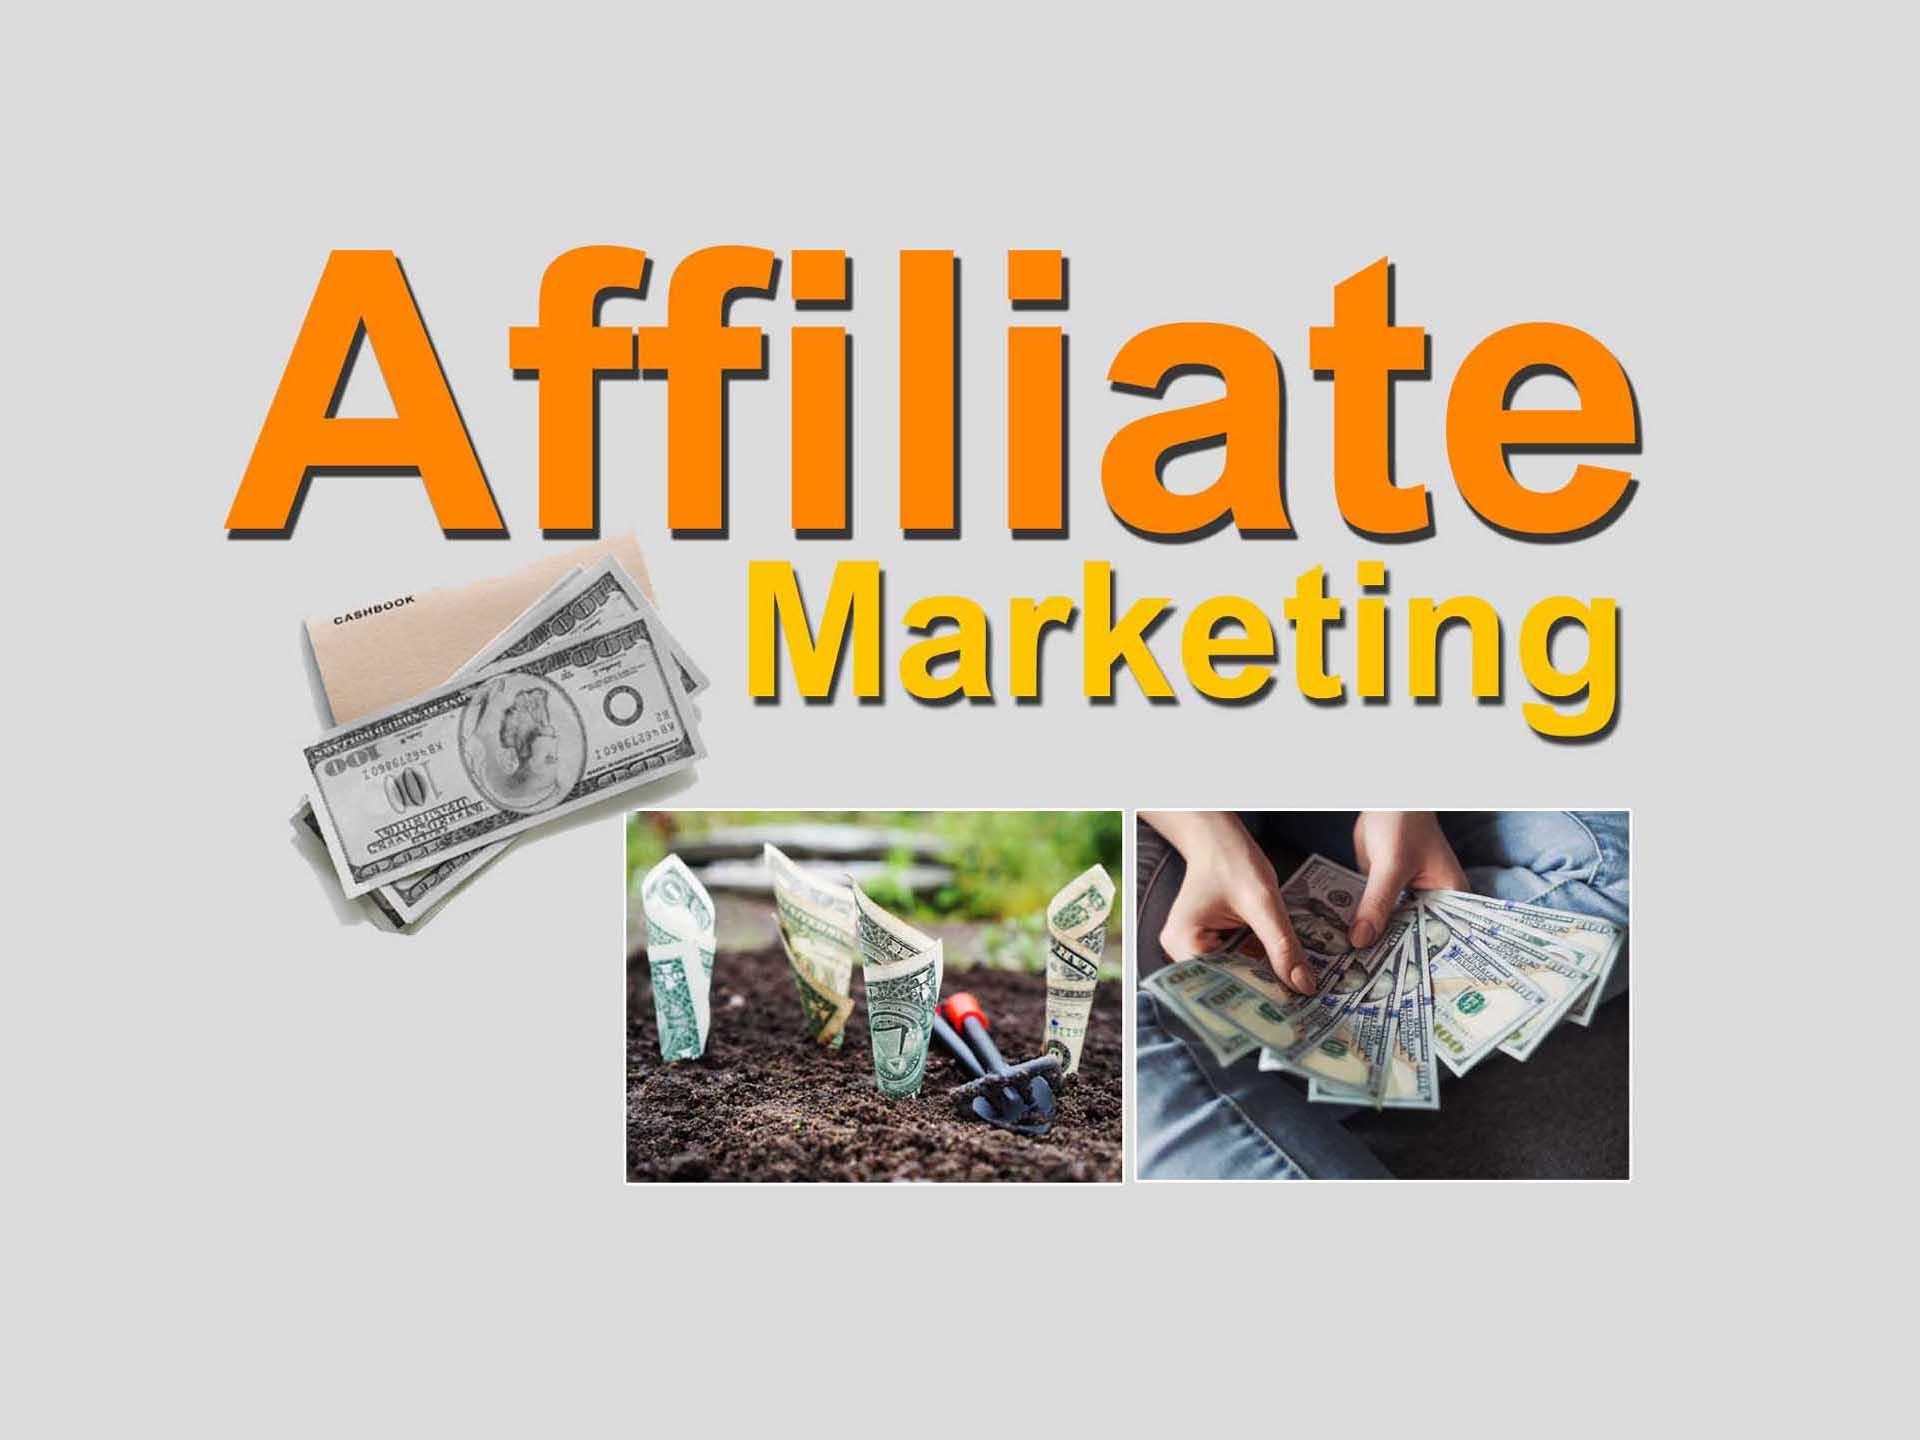 Affiliate marketing tips -অ্যাফিলিয়েট মার্কেটিং কি